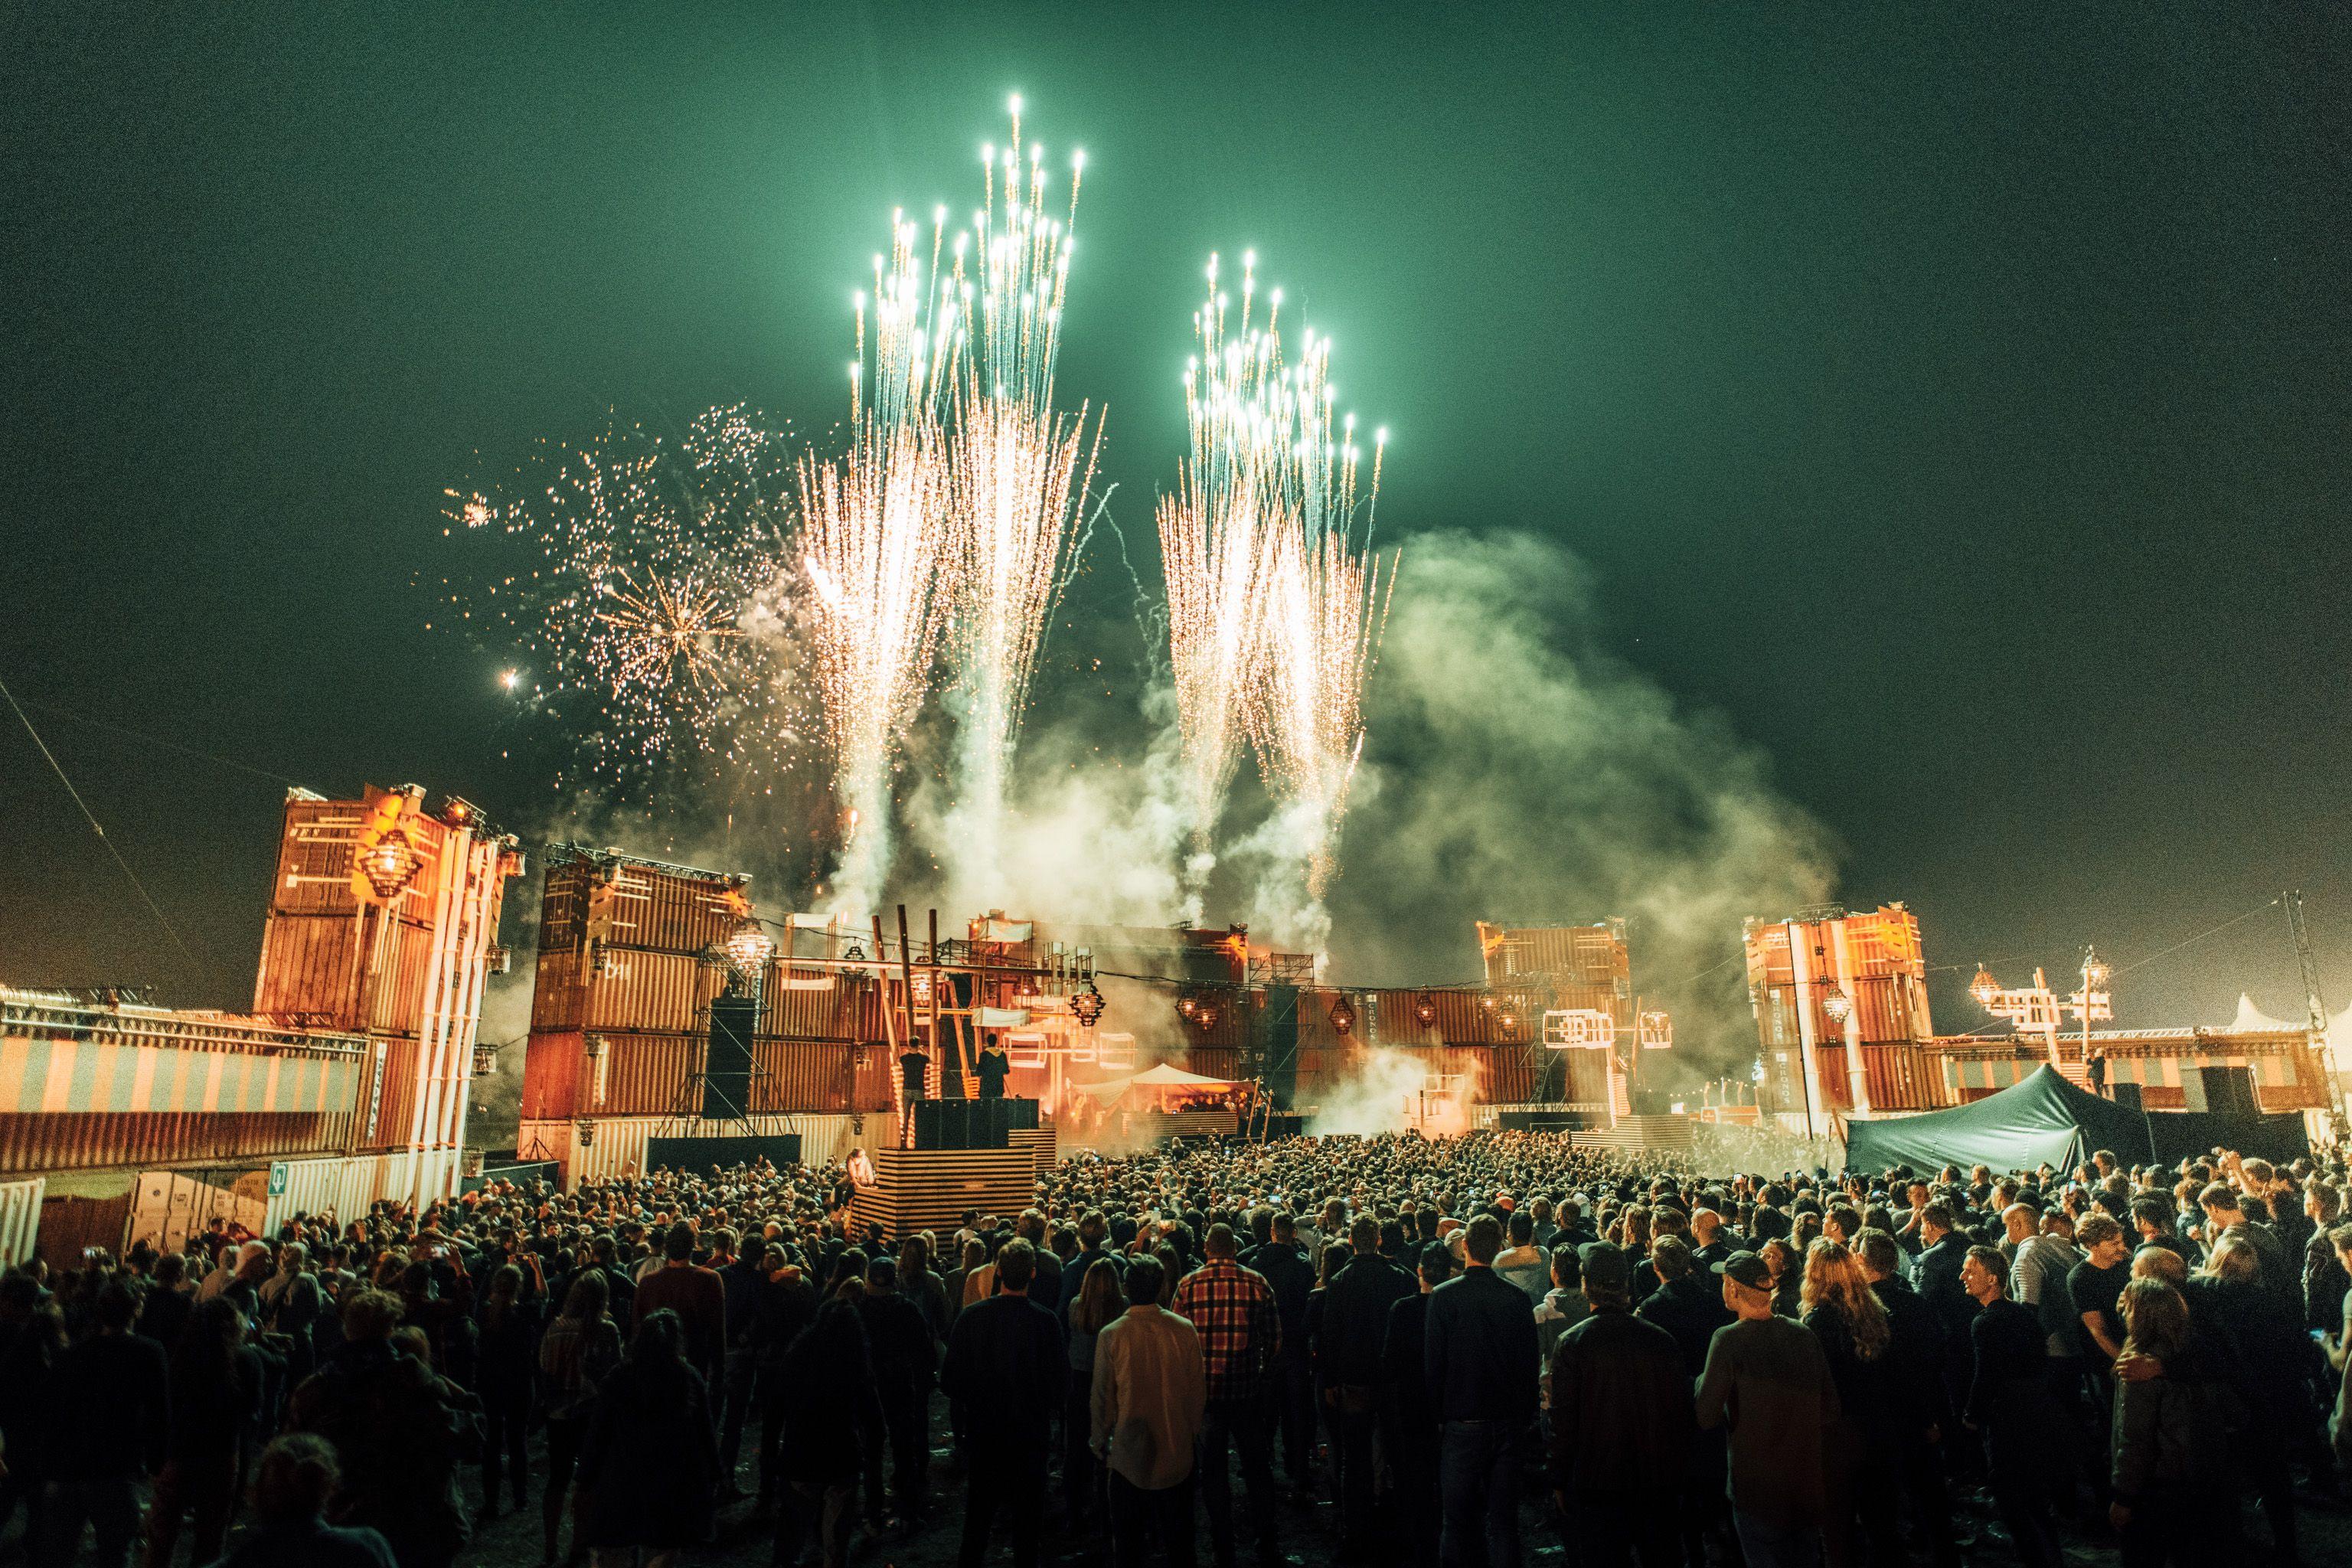 festivalguide-festival-agenda-2019-festivals